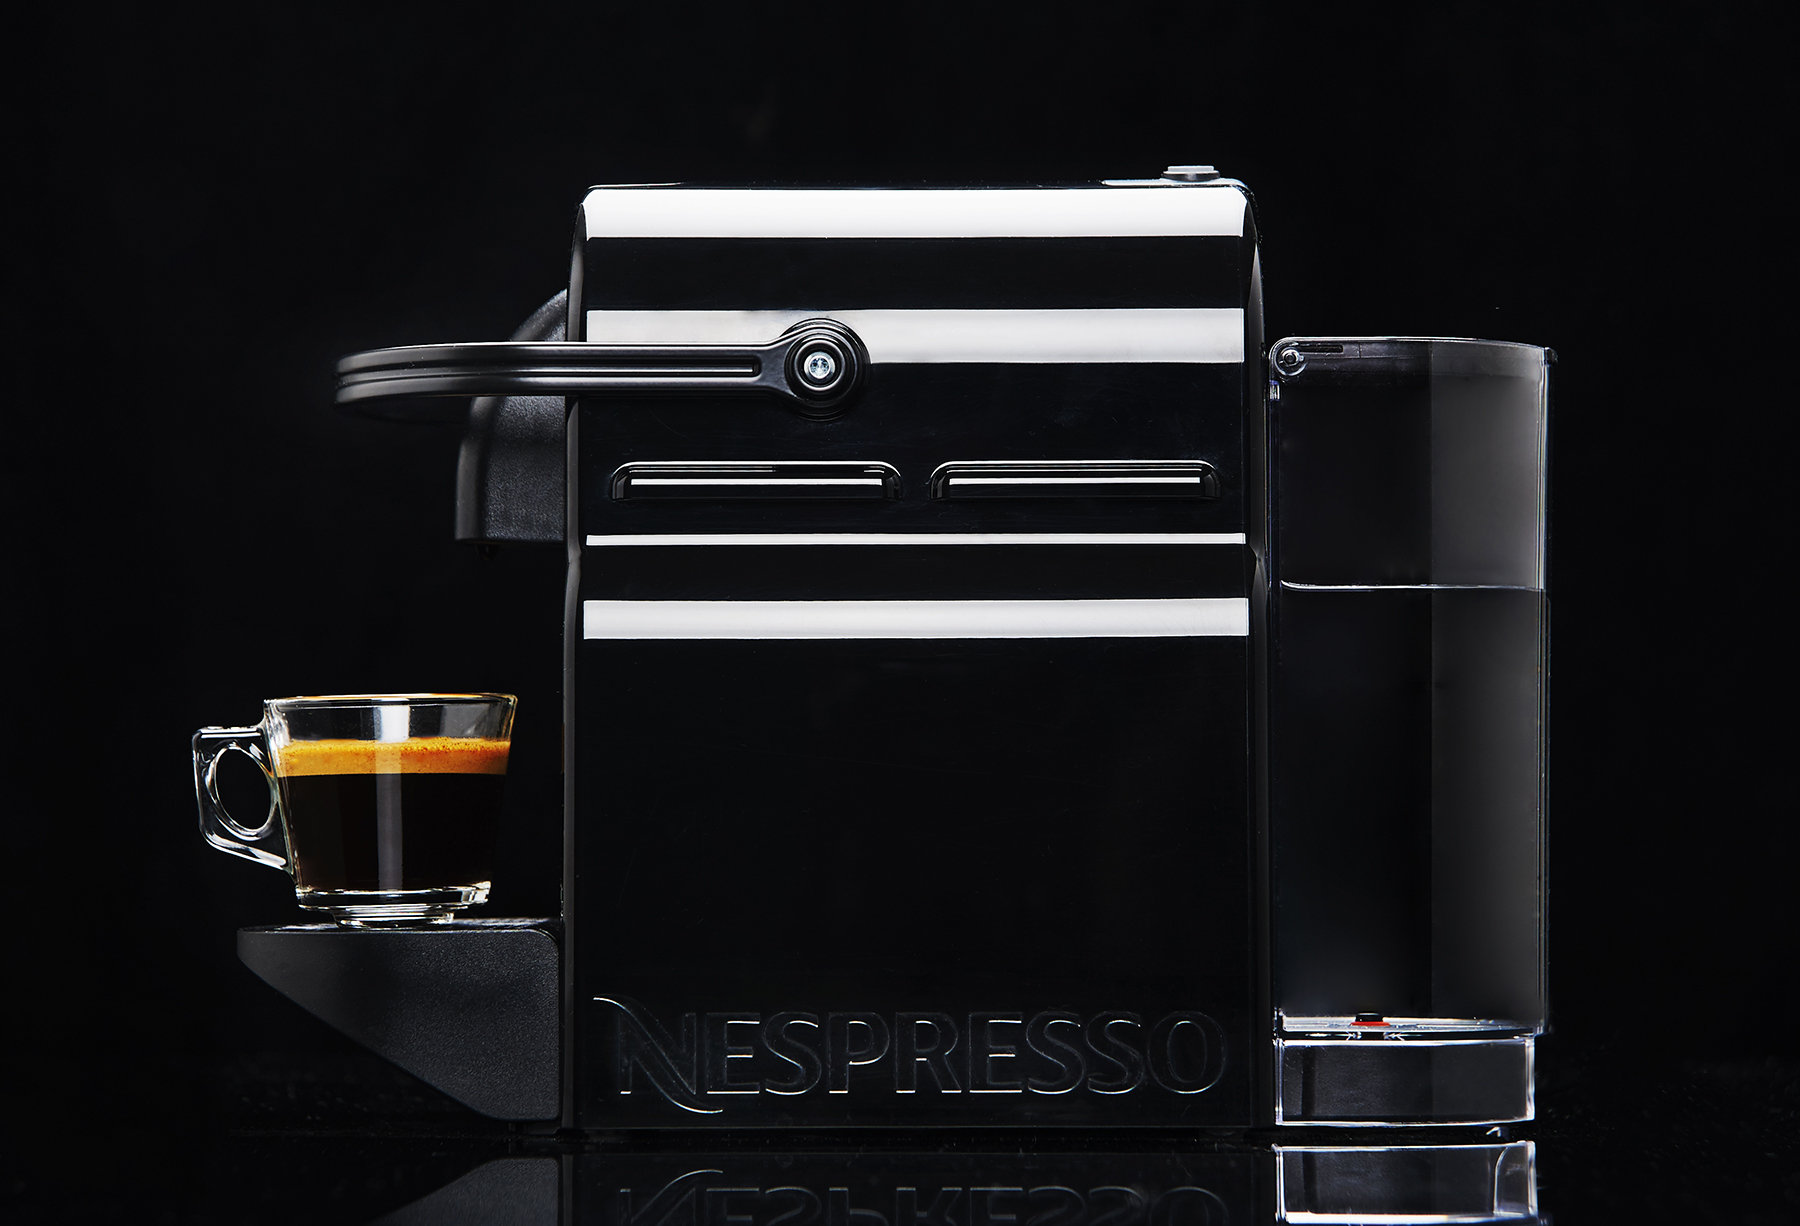 NespressoFull